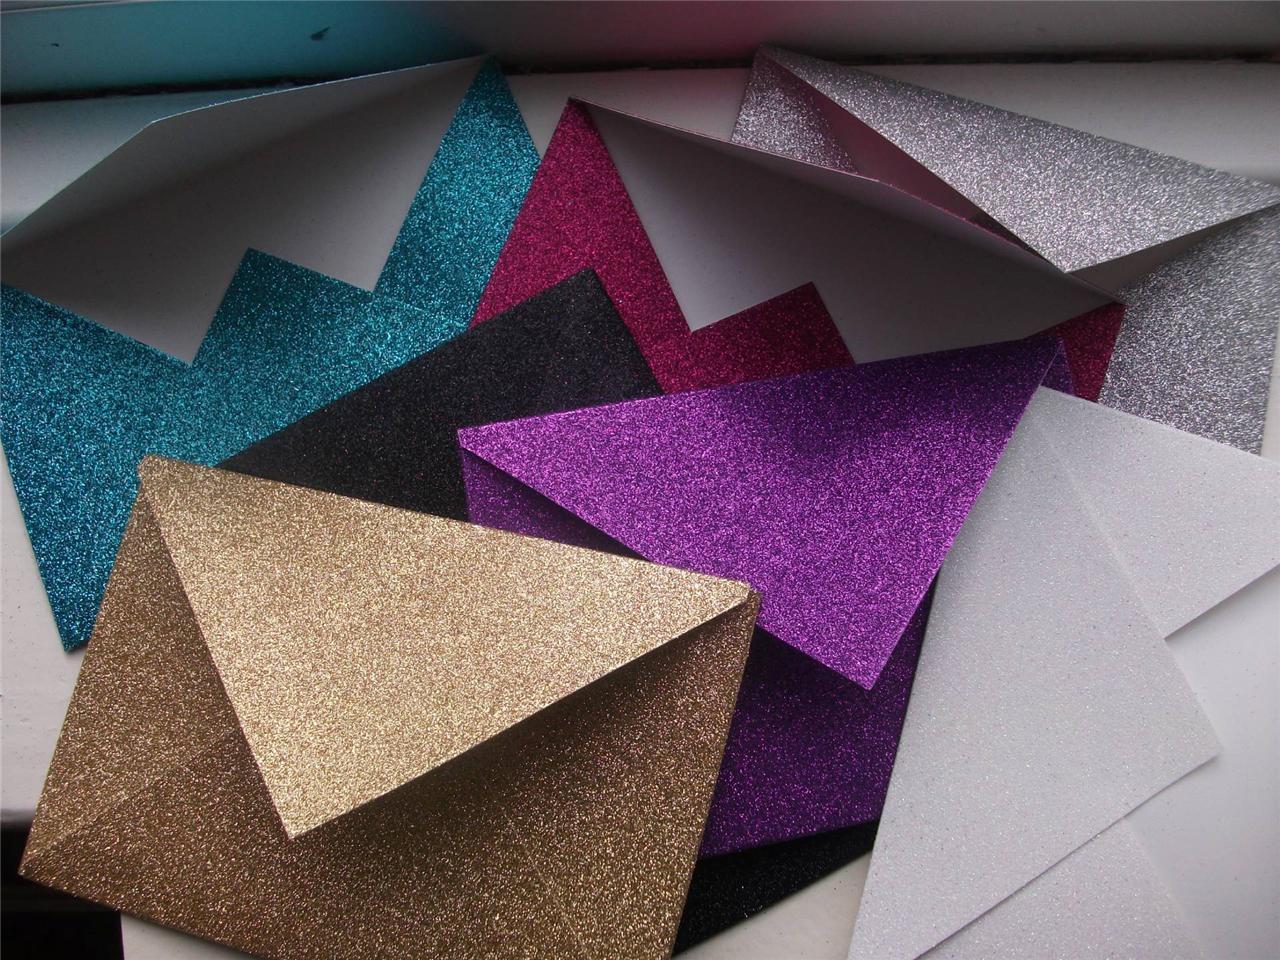 Wedding Money Gift Envelopes Uk : A6-Envelope-Wallet-Money-Gift-Wedding-Day-Voucher-Present-Card-Craft ...